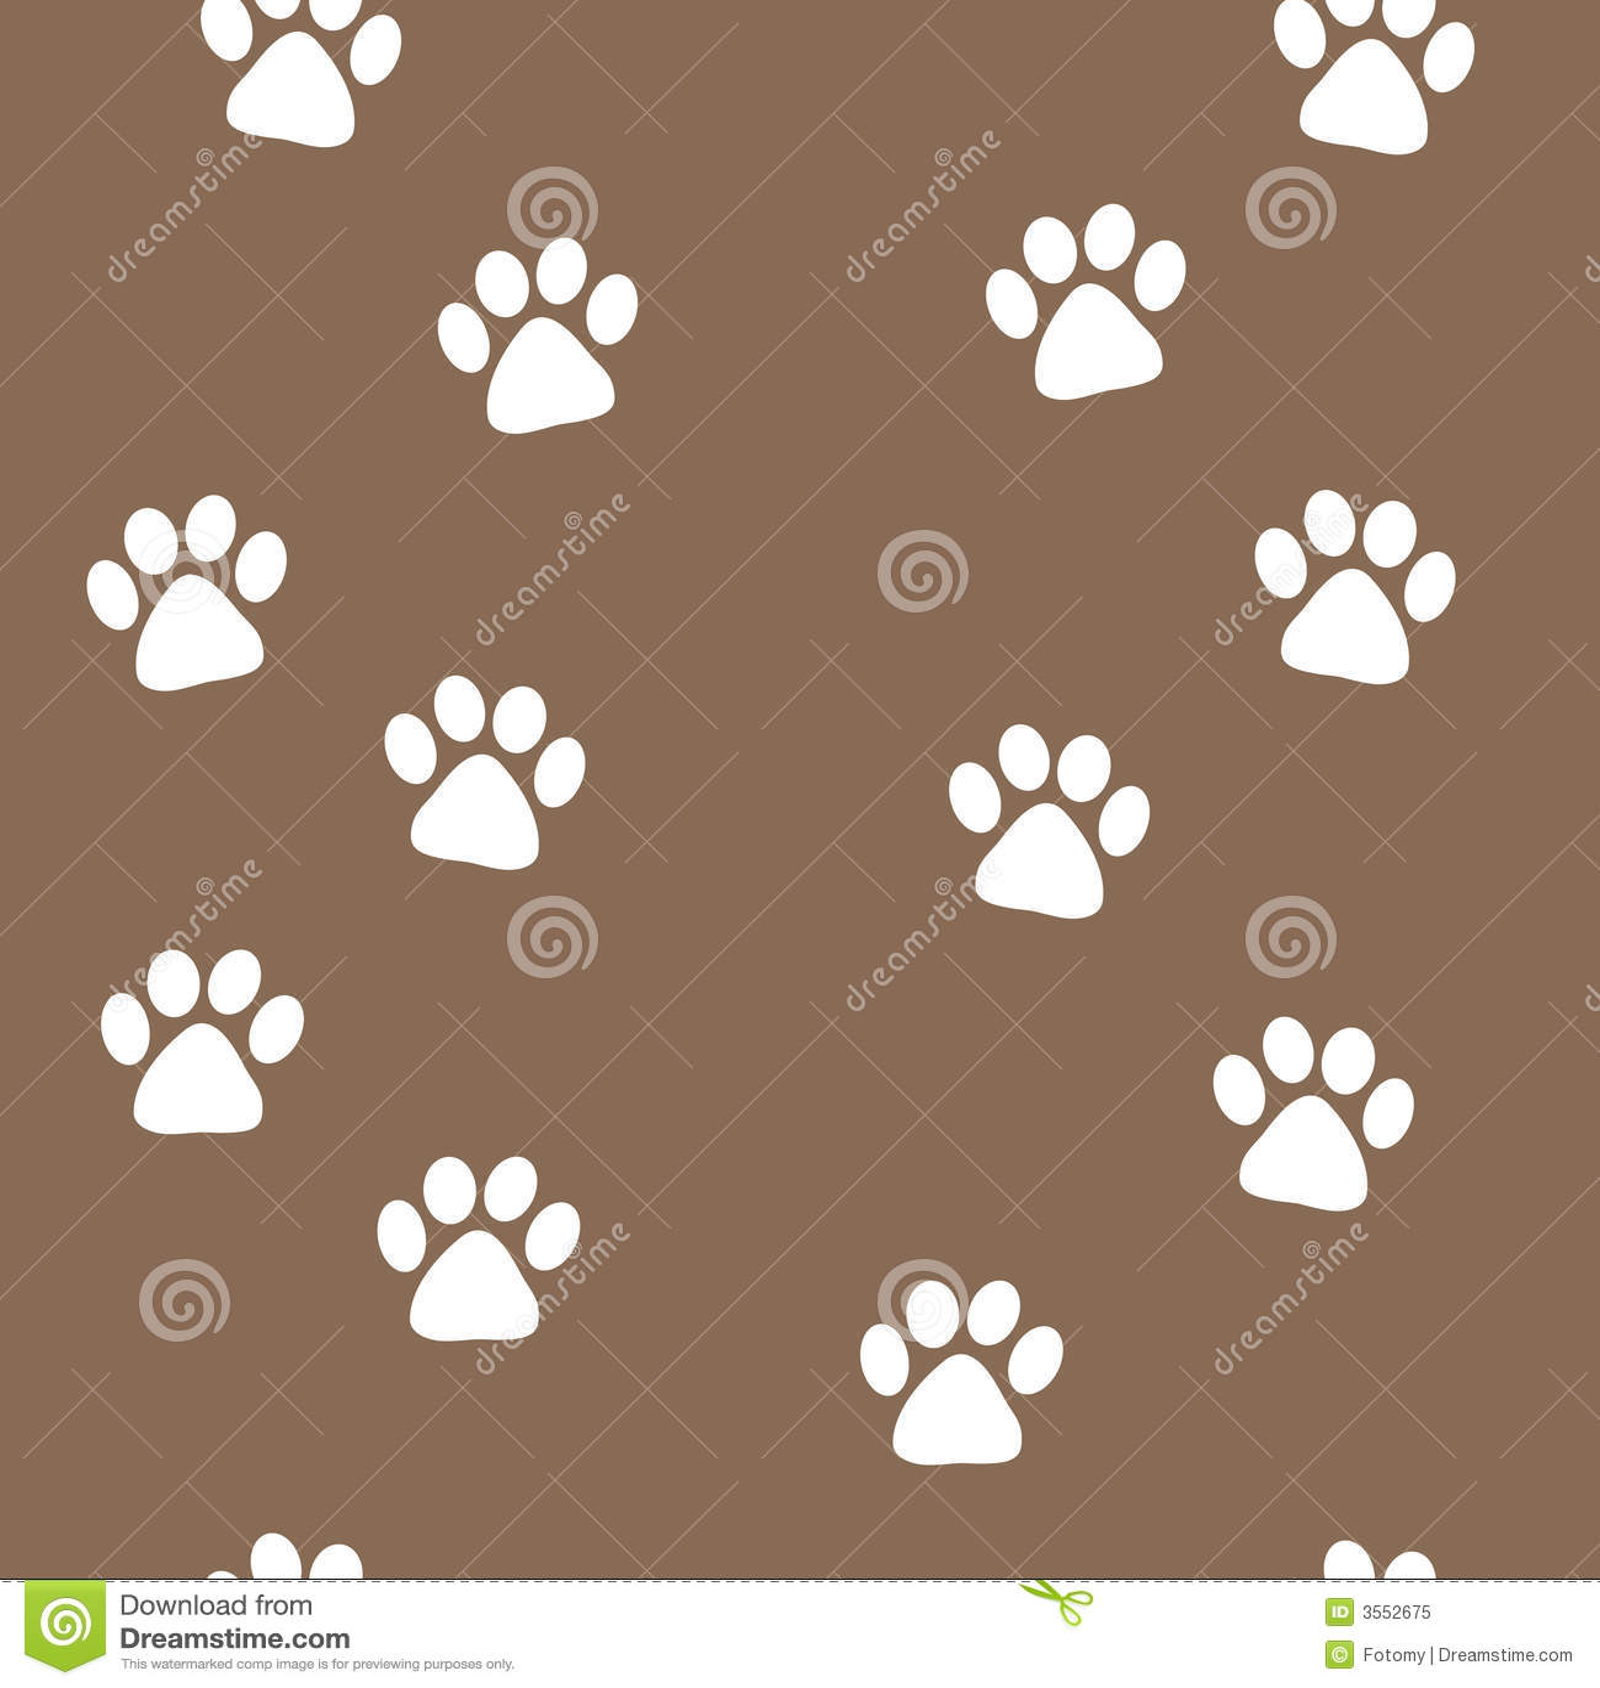 Animal foot prints patterns - photo#27